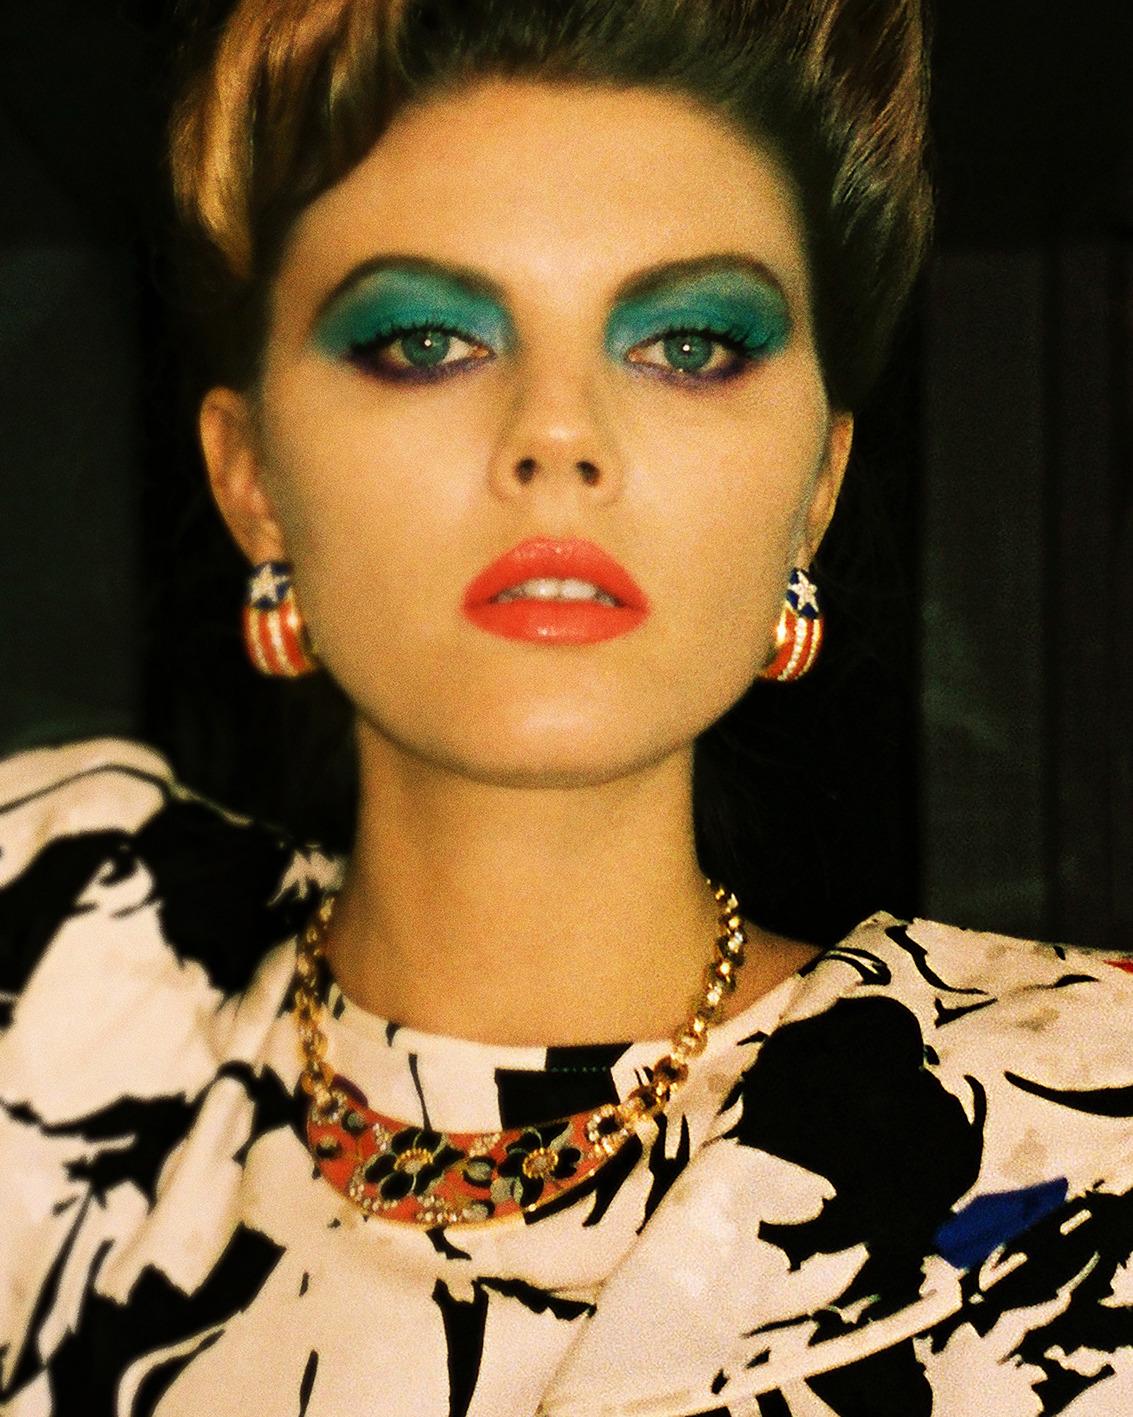 Maryna Linchuk by Branislav Simoncik Vogue Czechoslovakia Jan 2019 (34).jpg